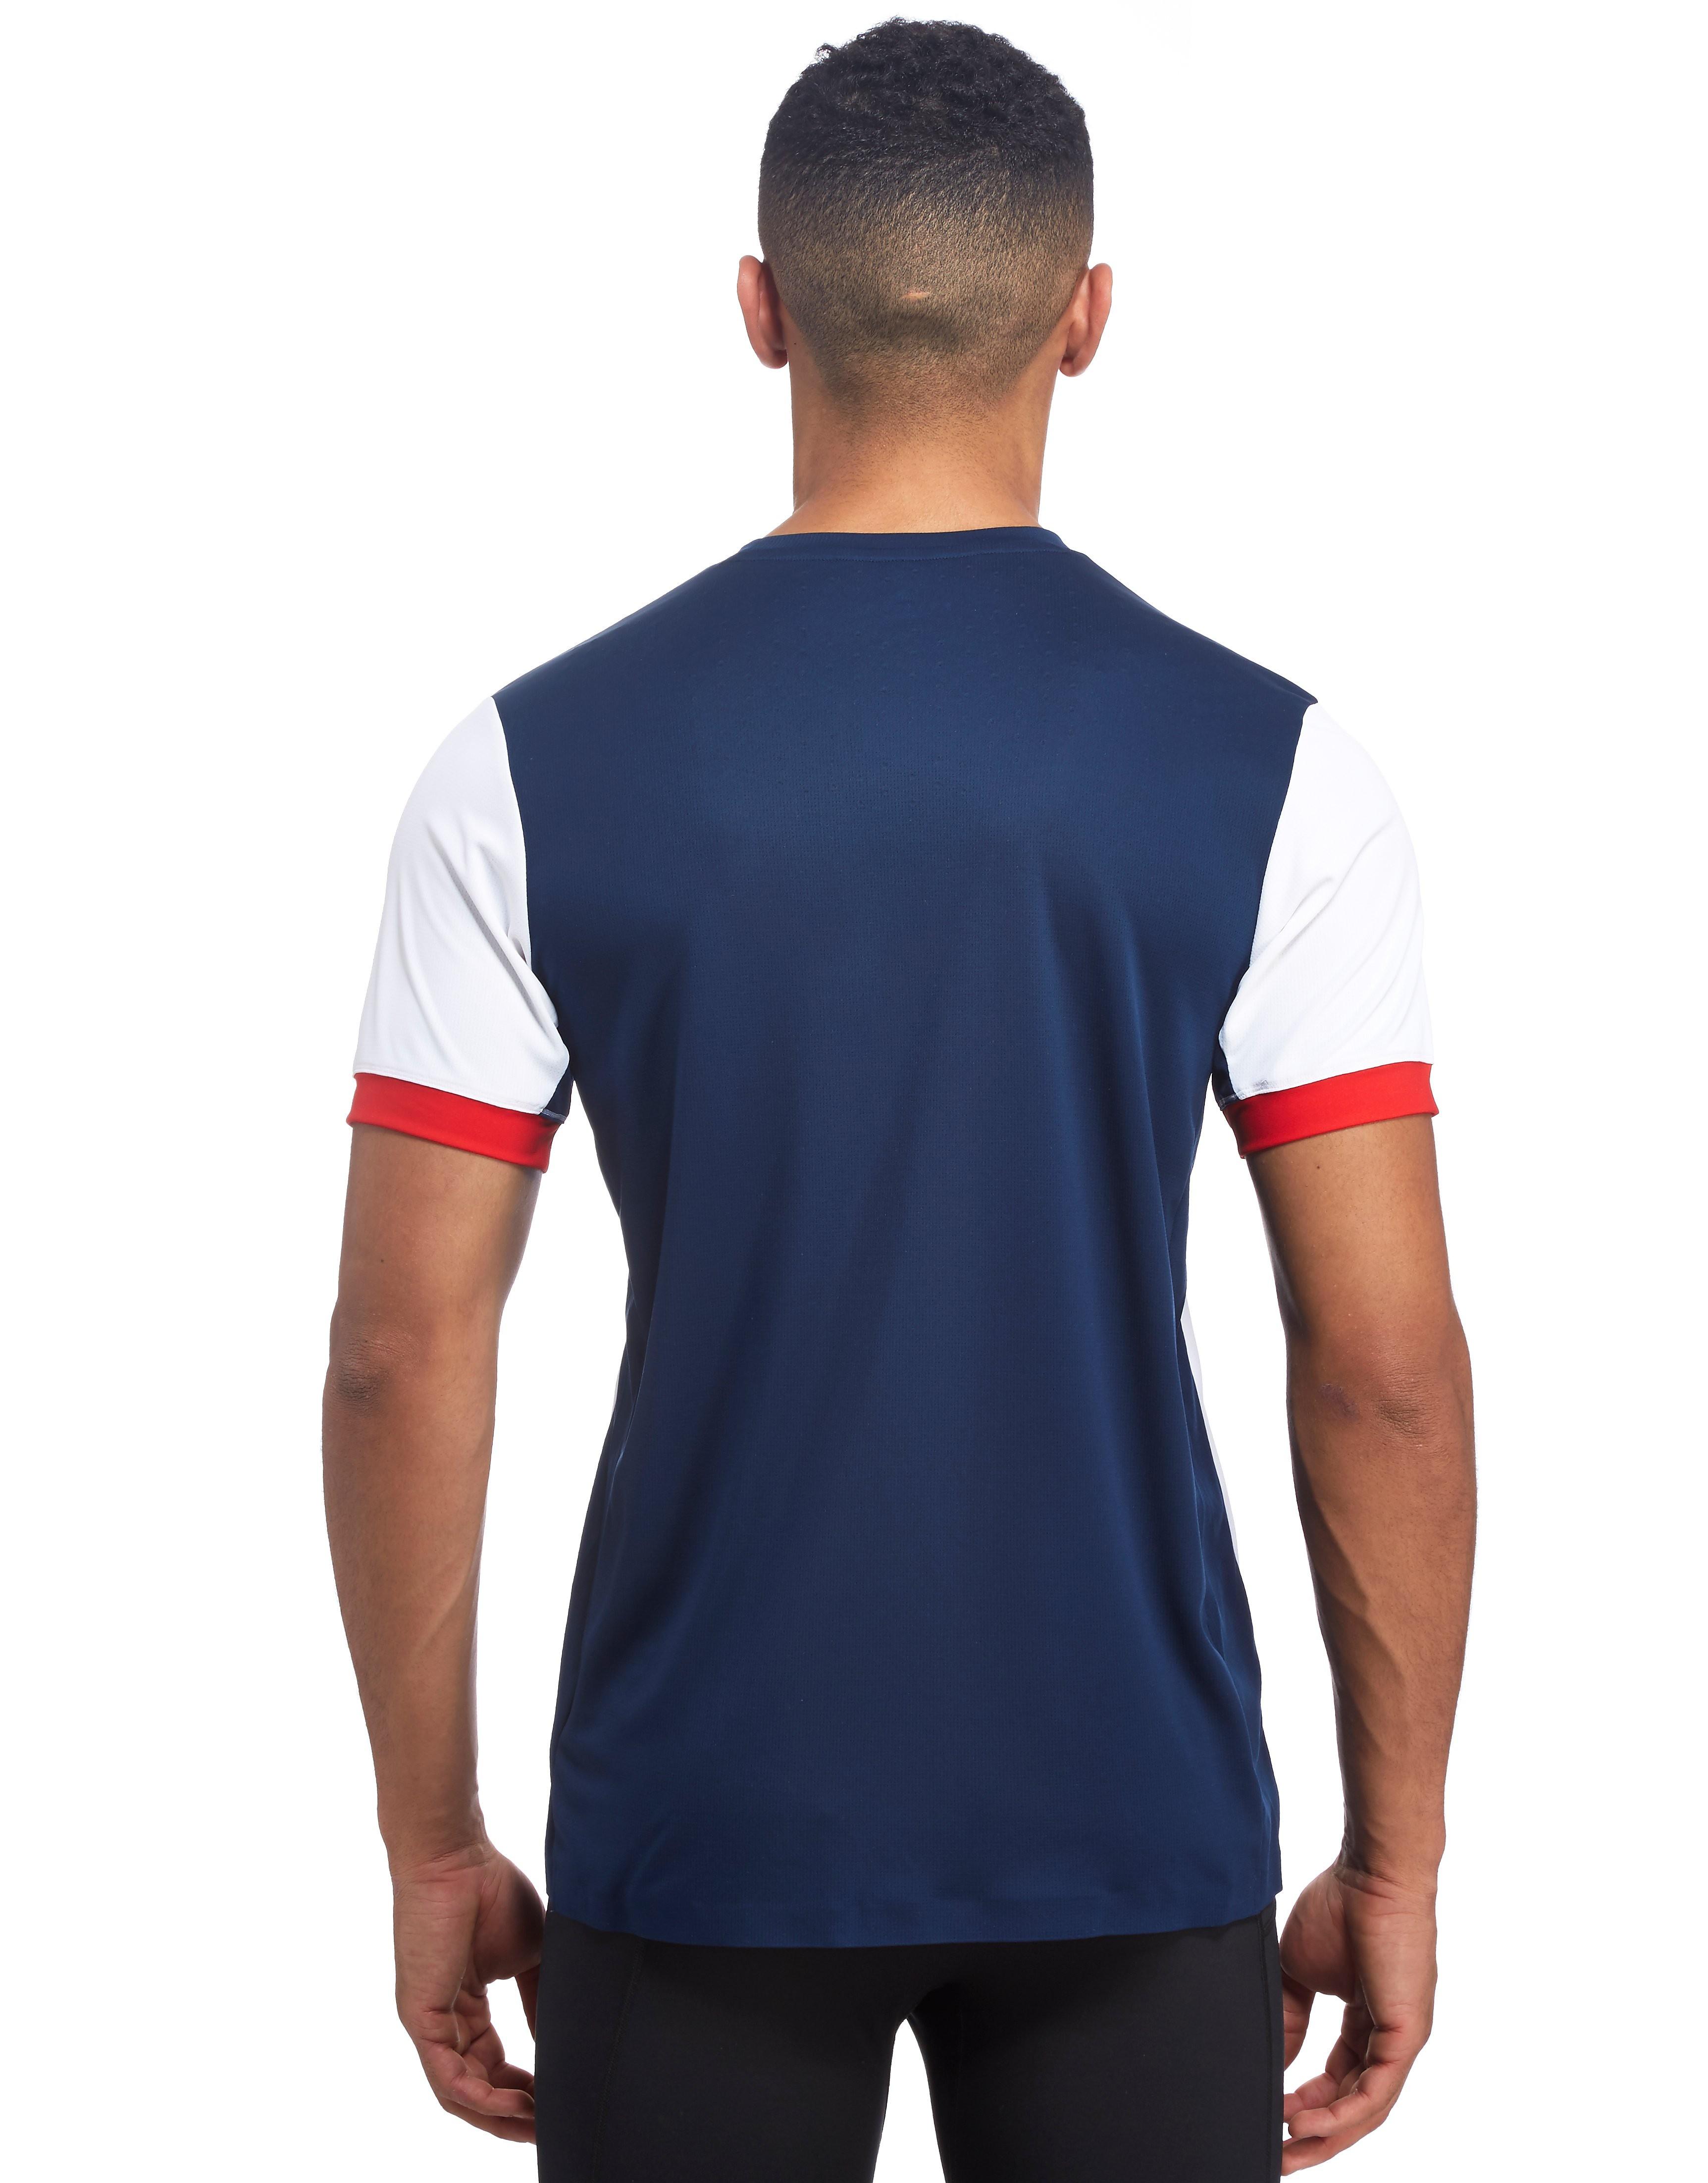 adidas Team GB 2016 Tennis Climachill T-Shirt